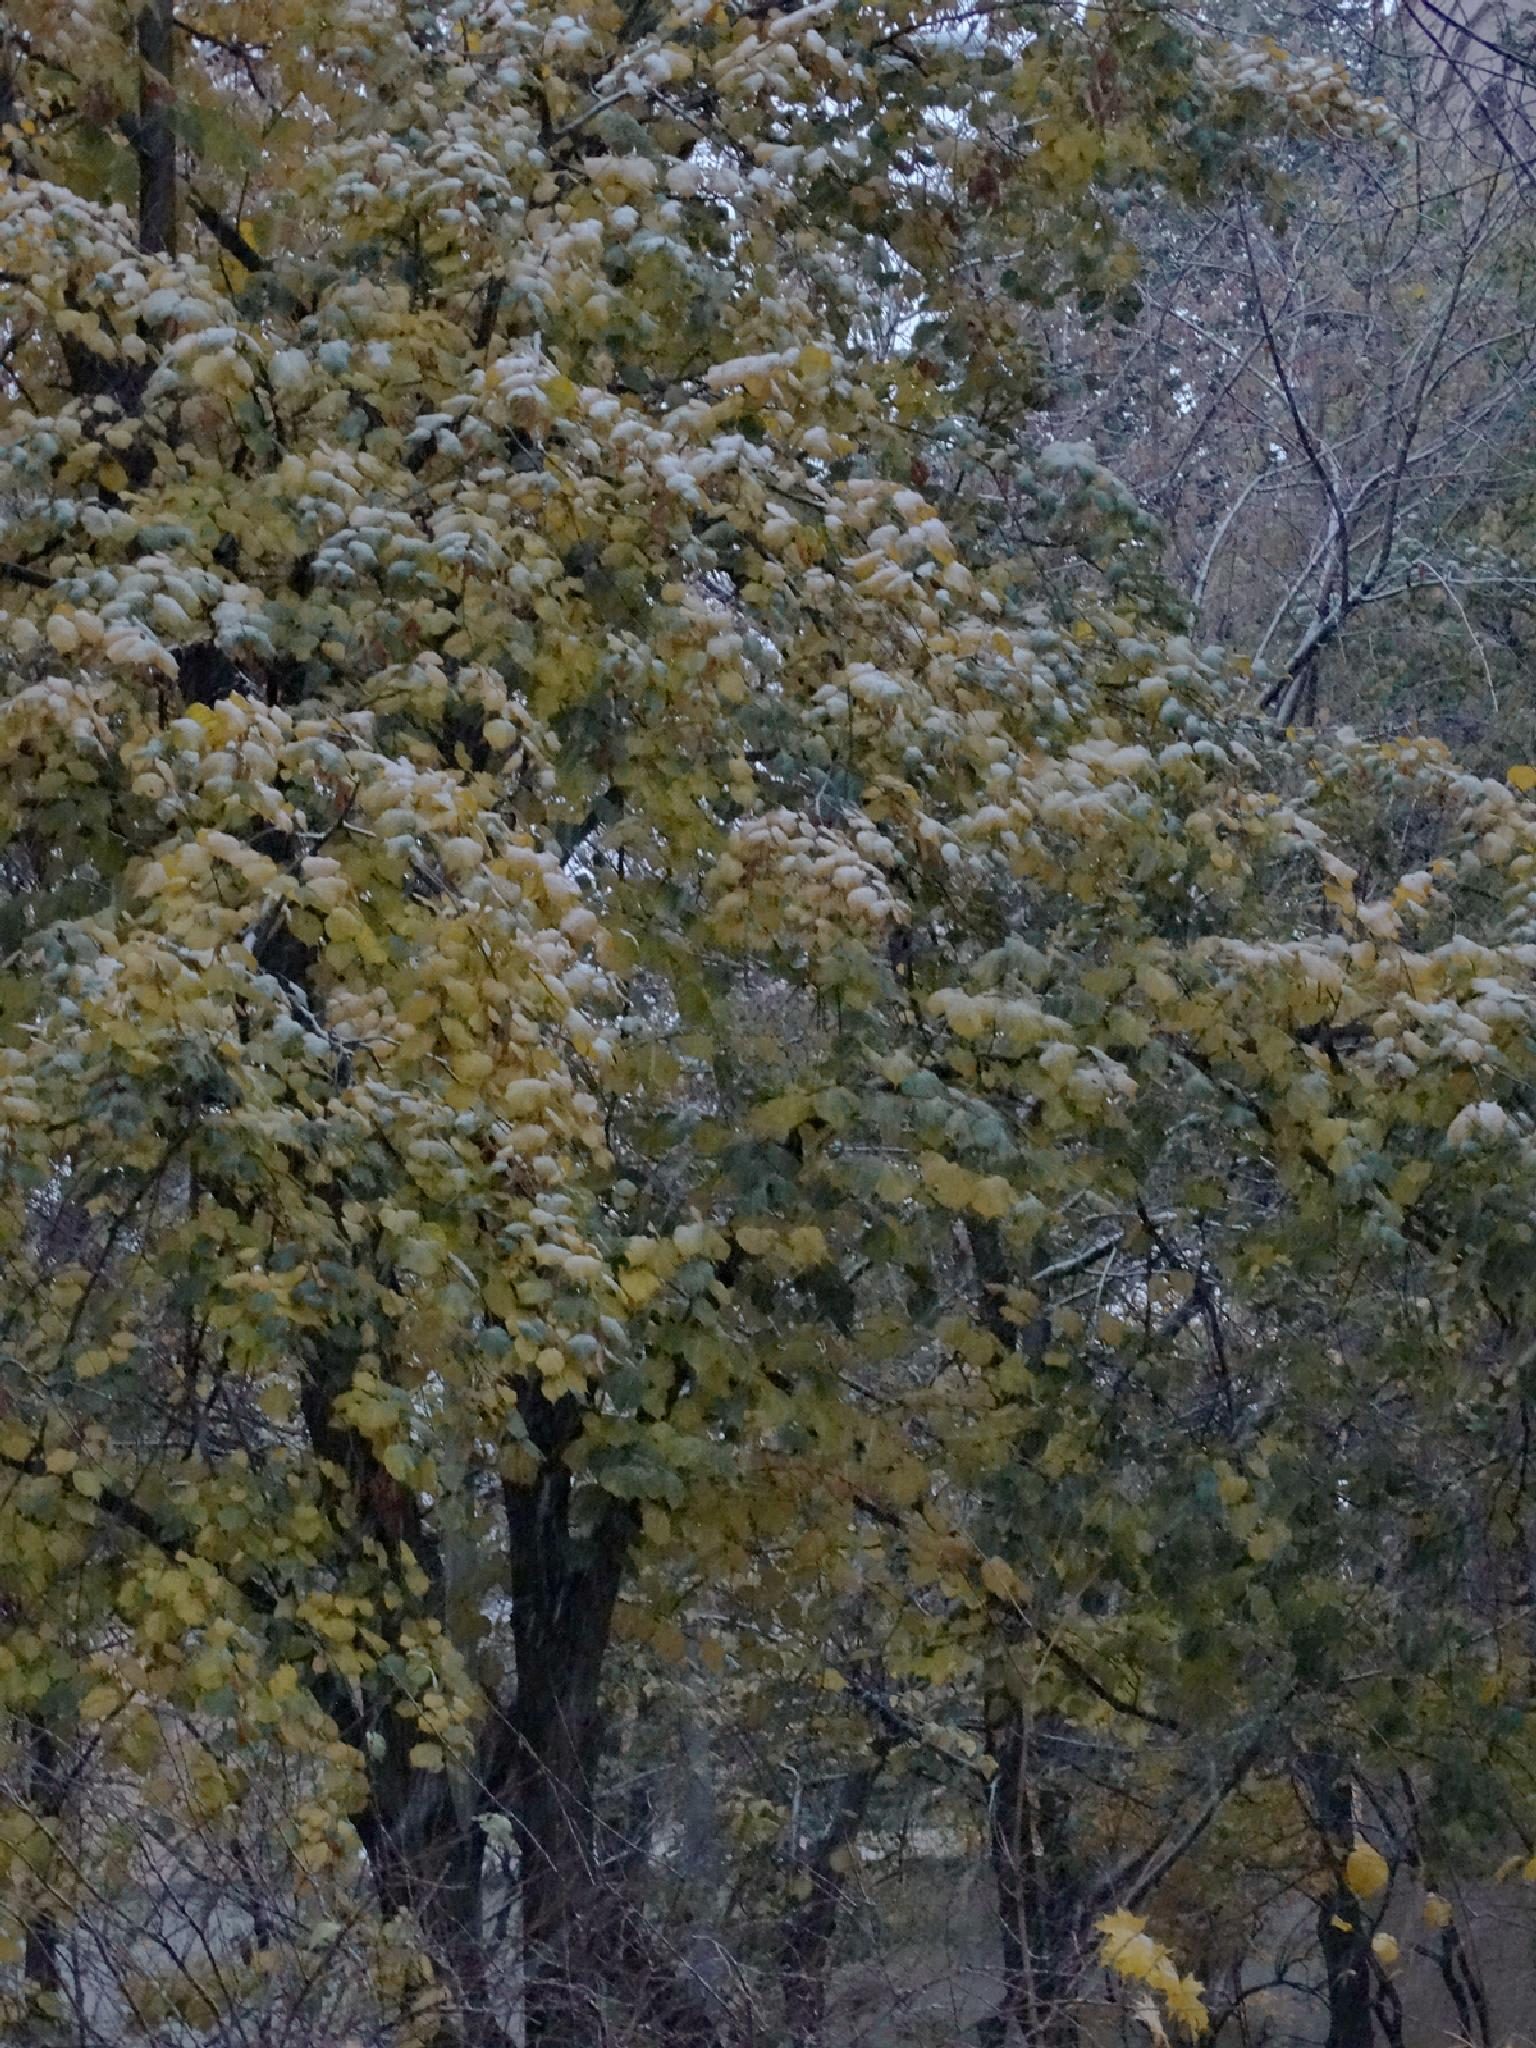 Снег, укрывший листву by tarutinaolga2012